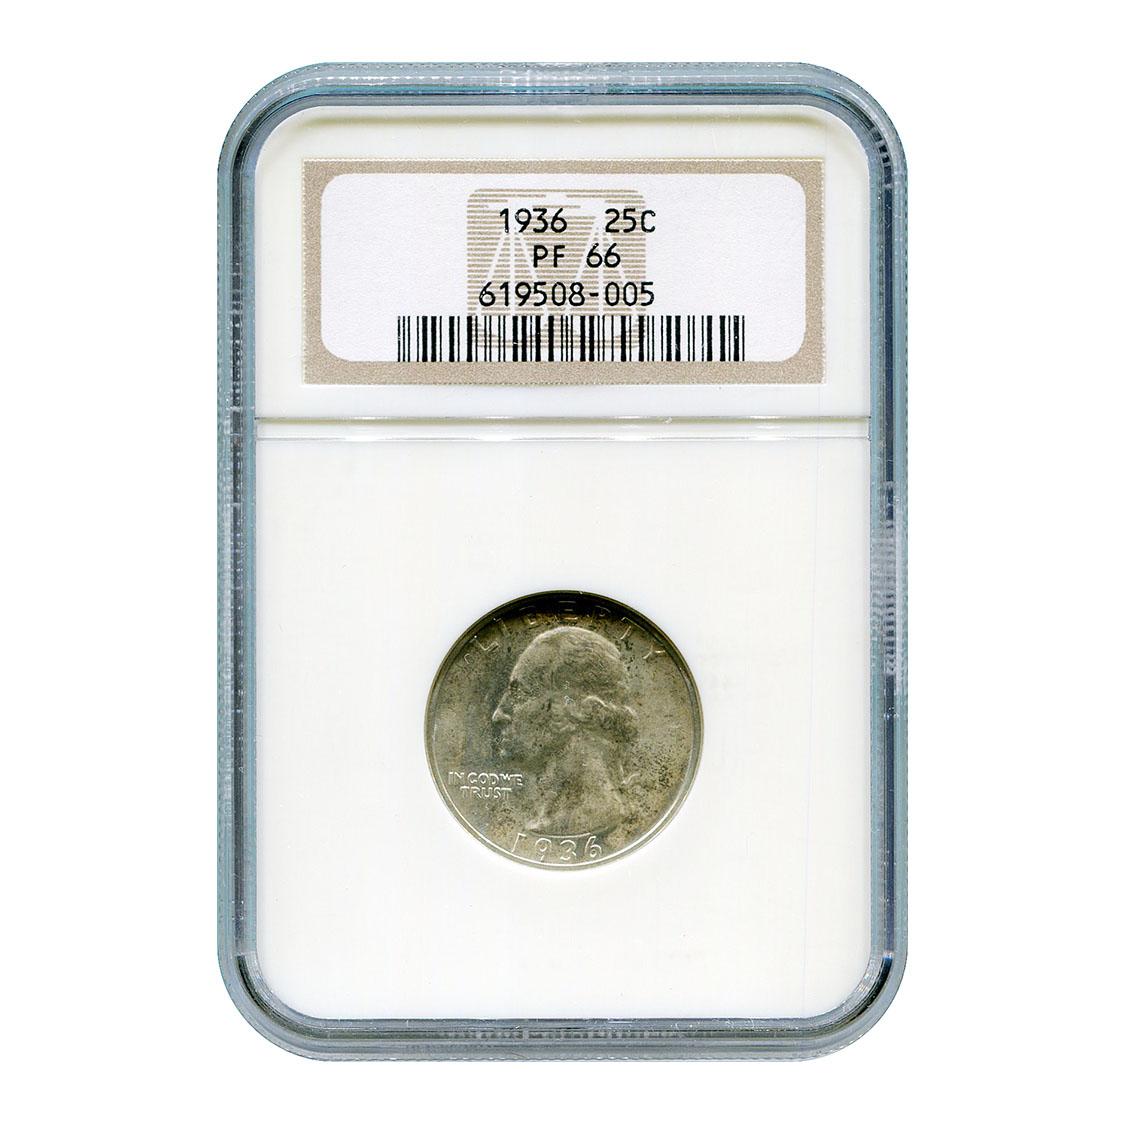 Certified Proof Washington Quarter 1936 PF66 NGC